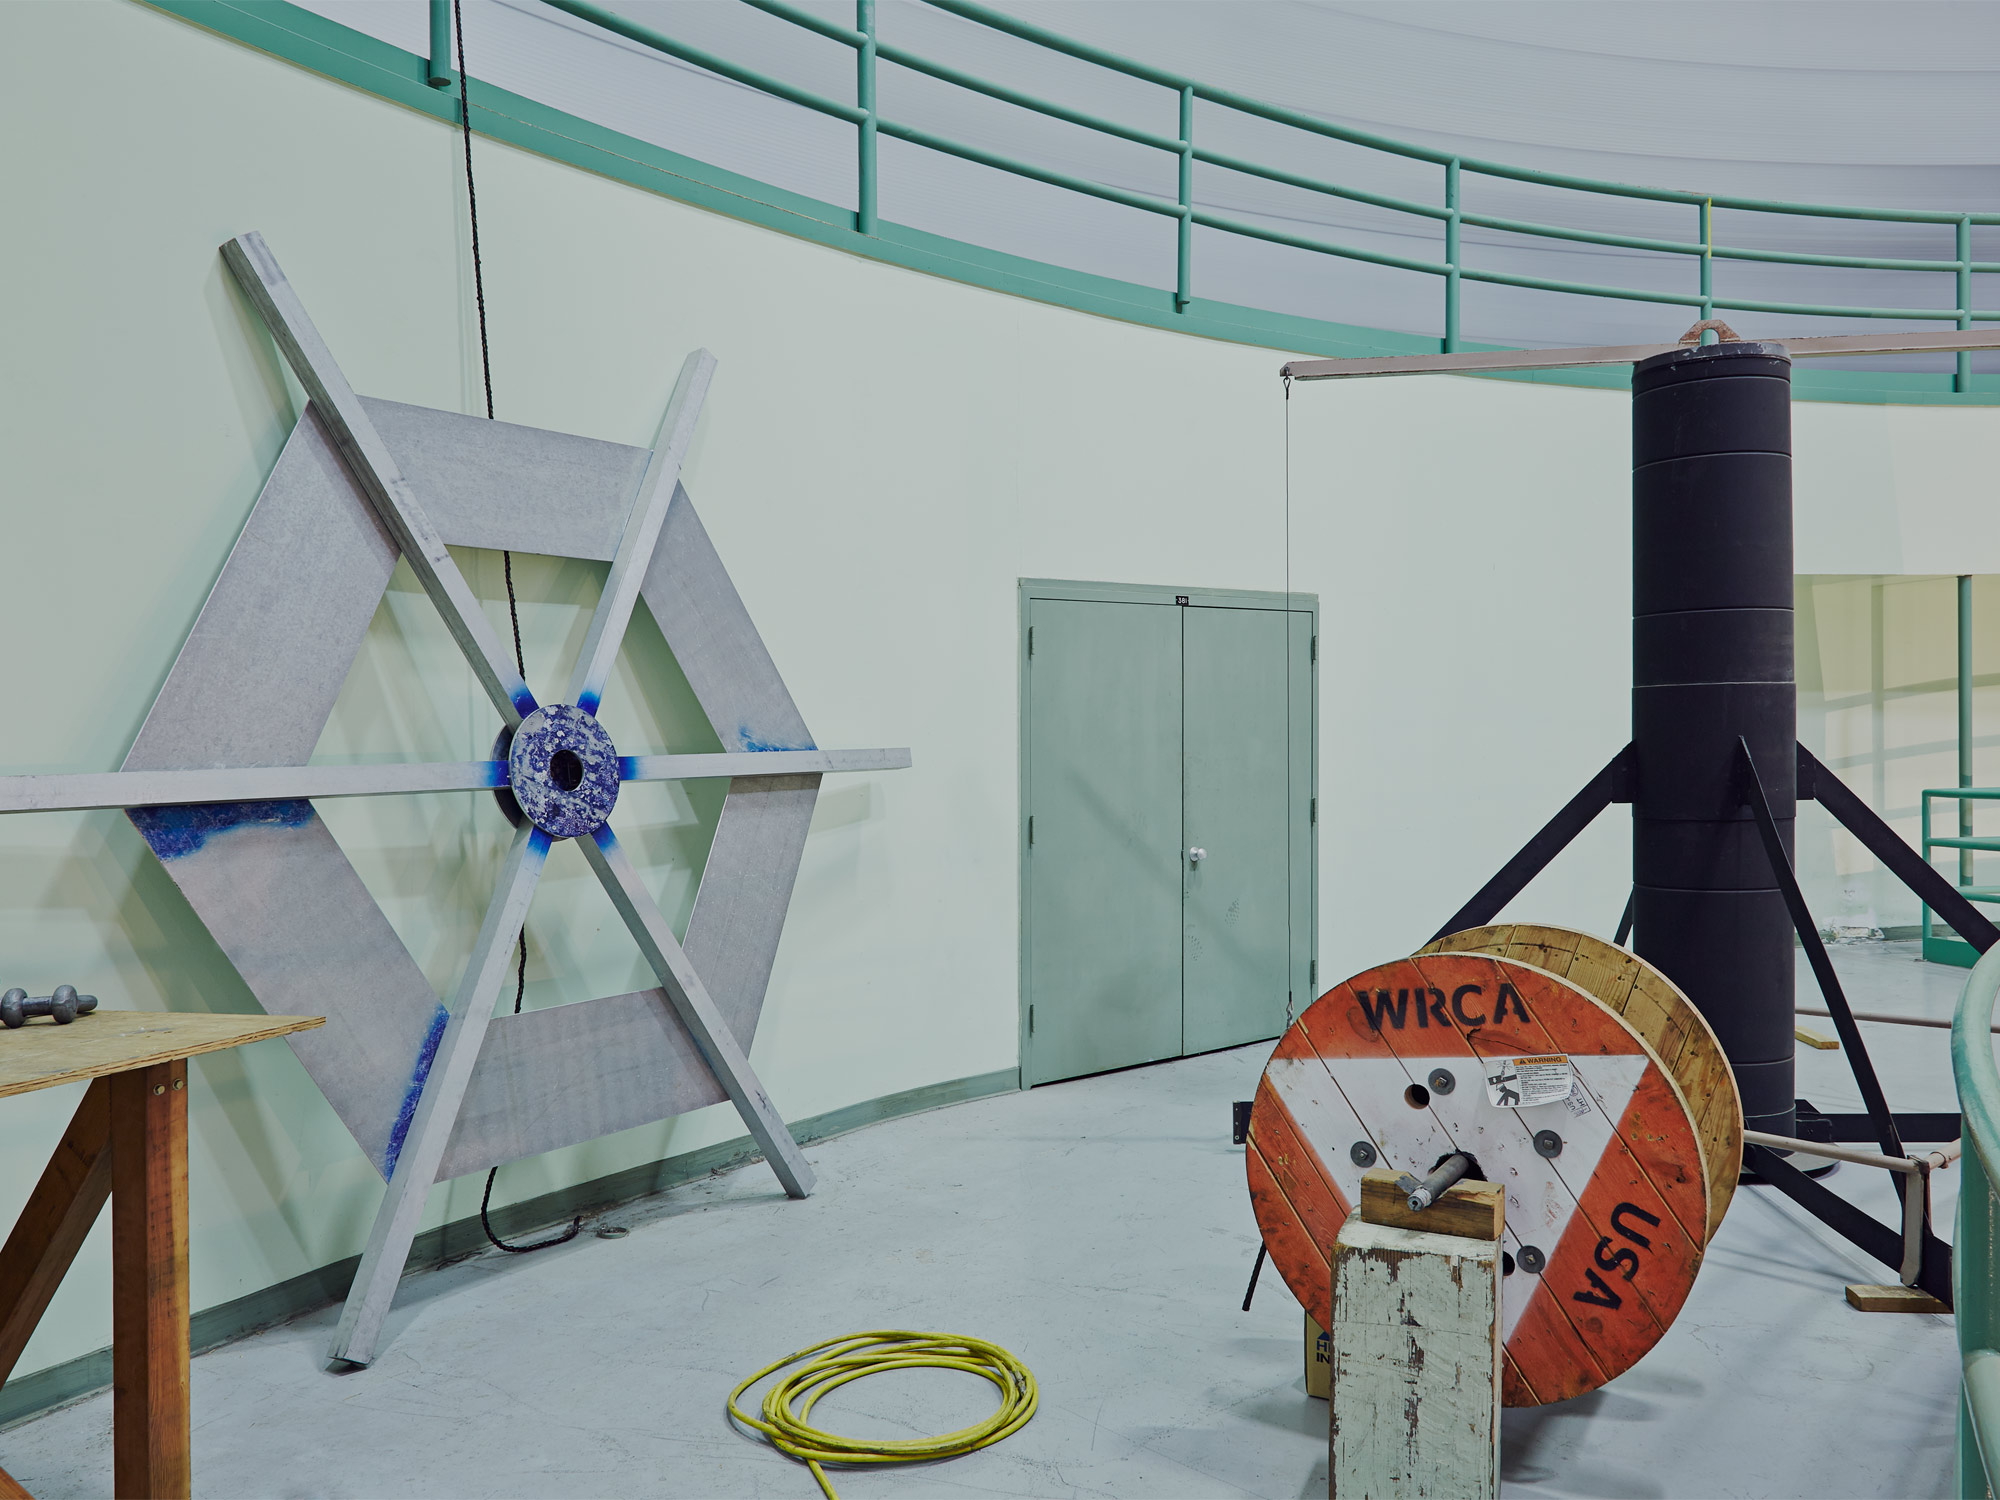 Disaster Playground - NBH Studios